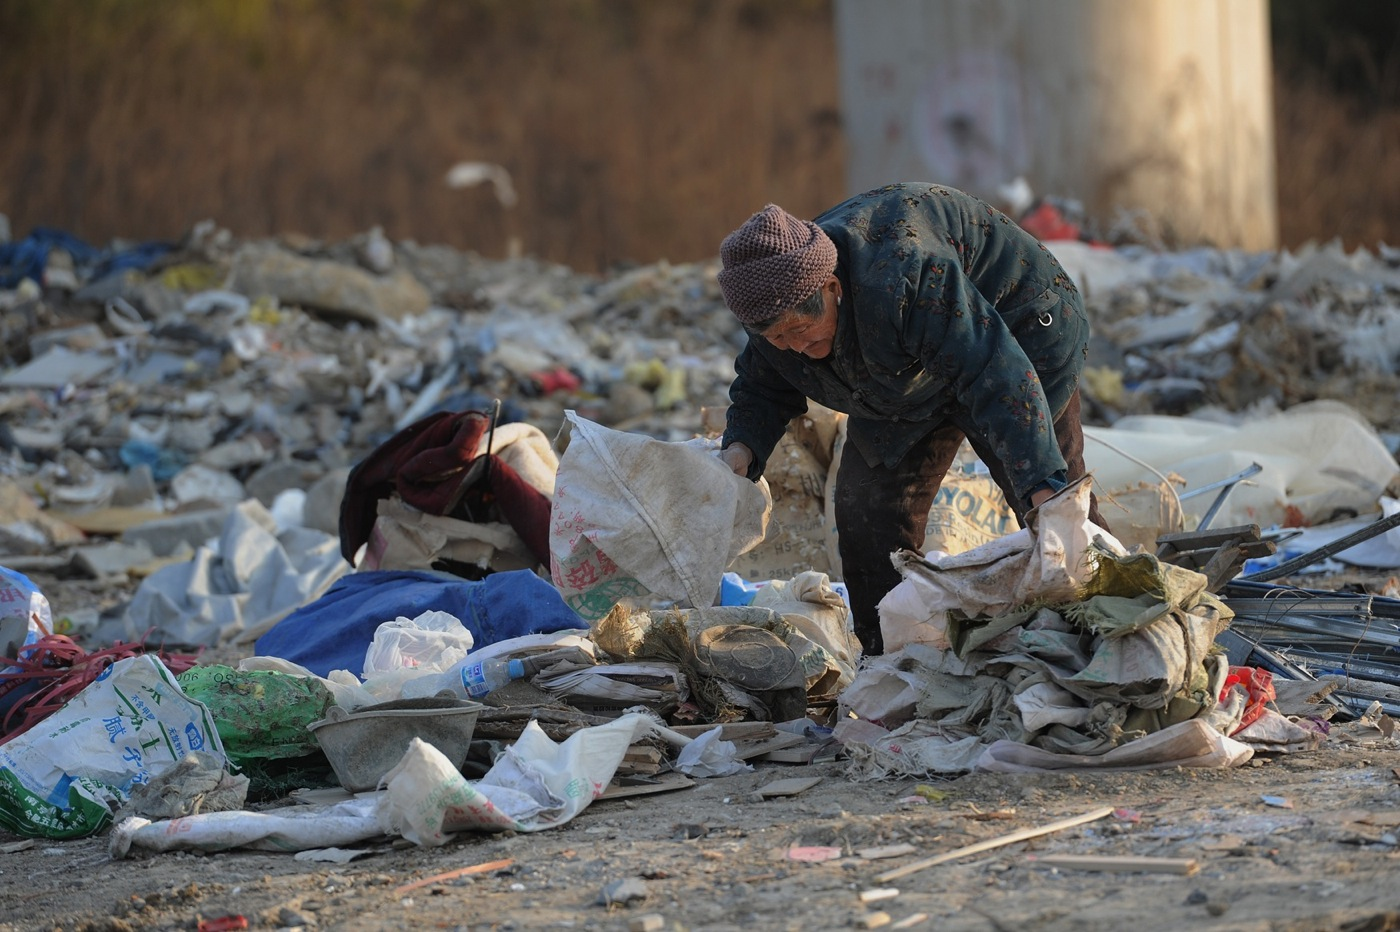 CHINA-ECONOMY-INCOME-WEALTH